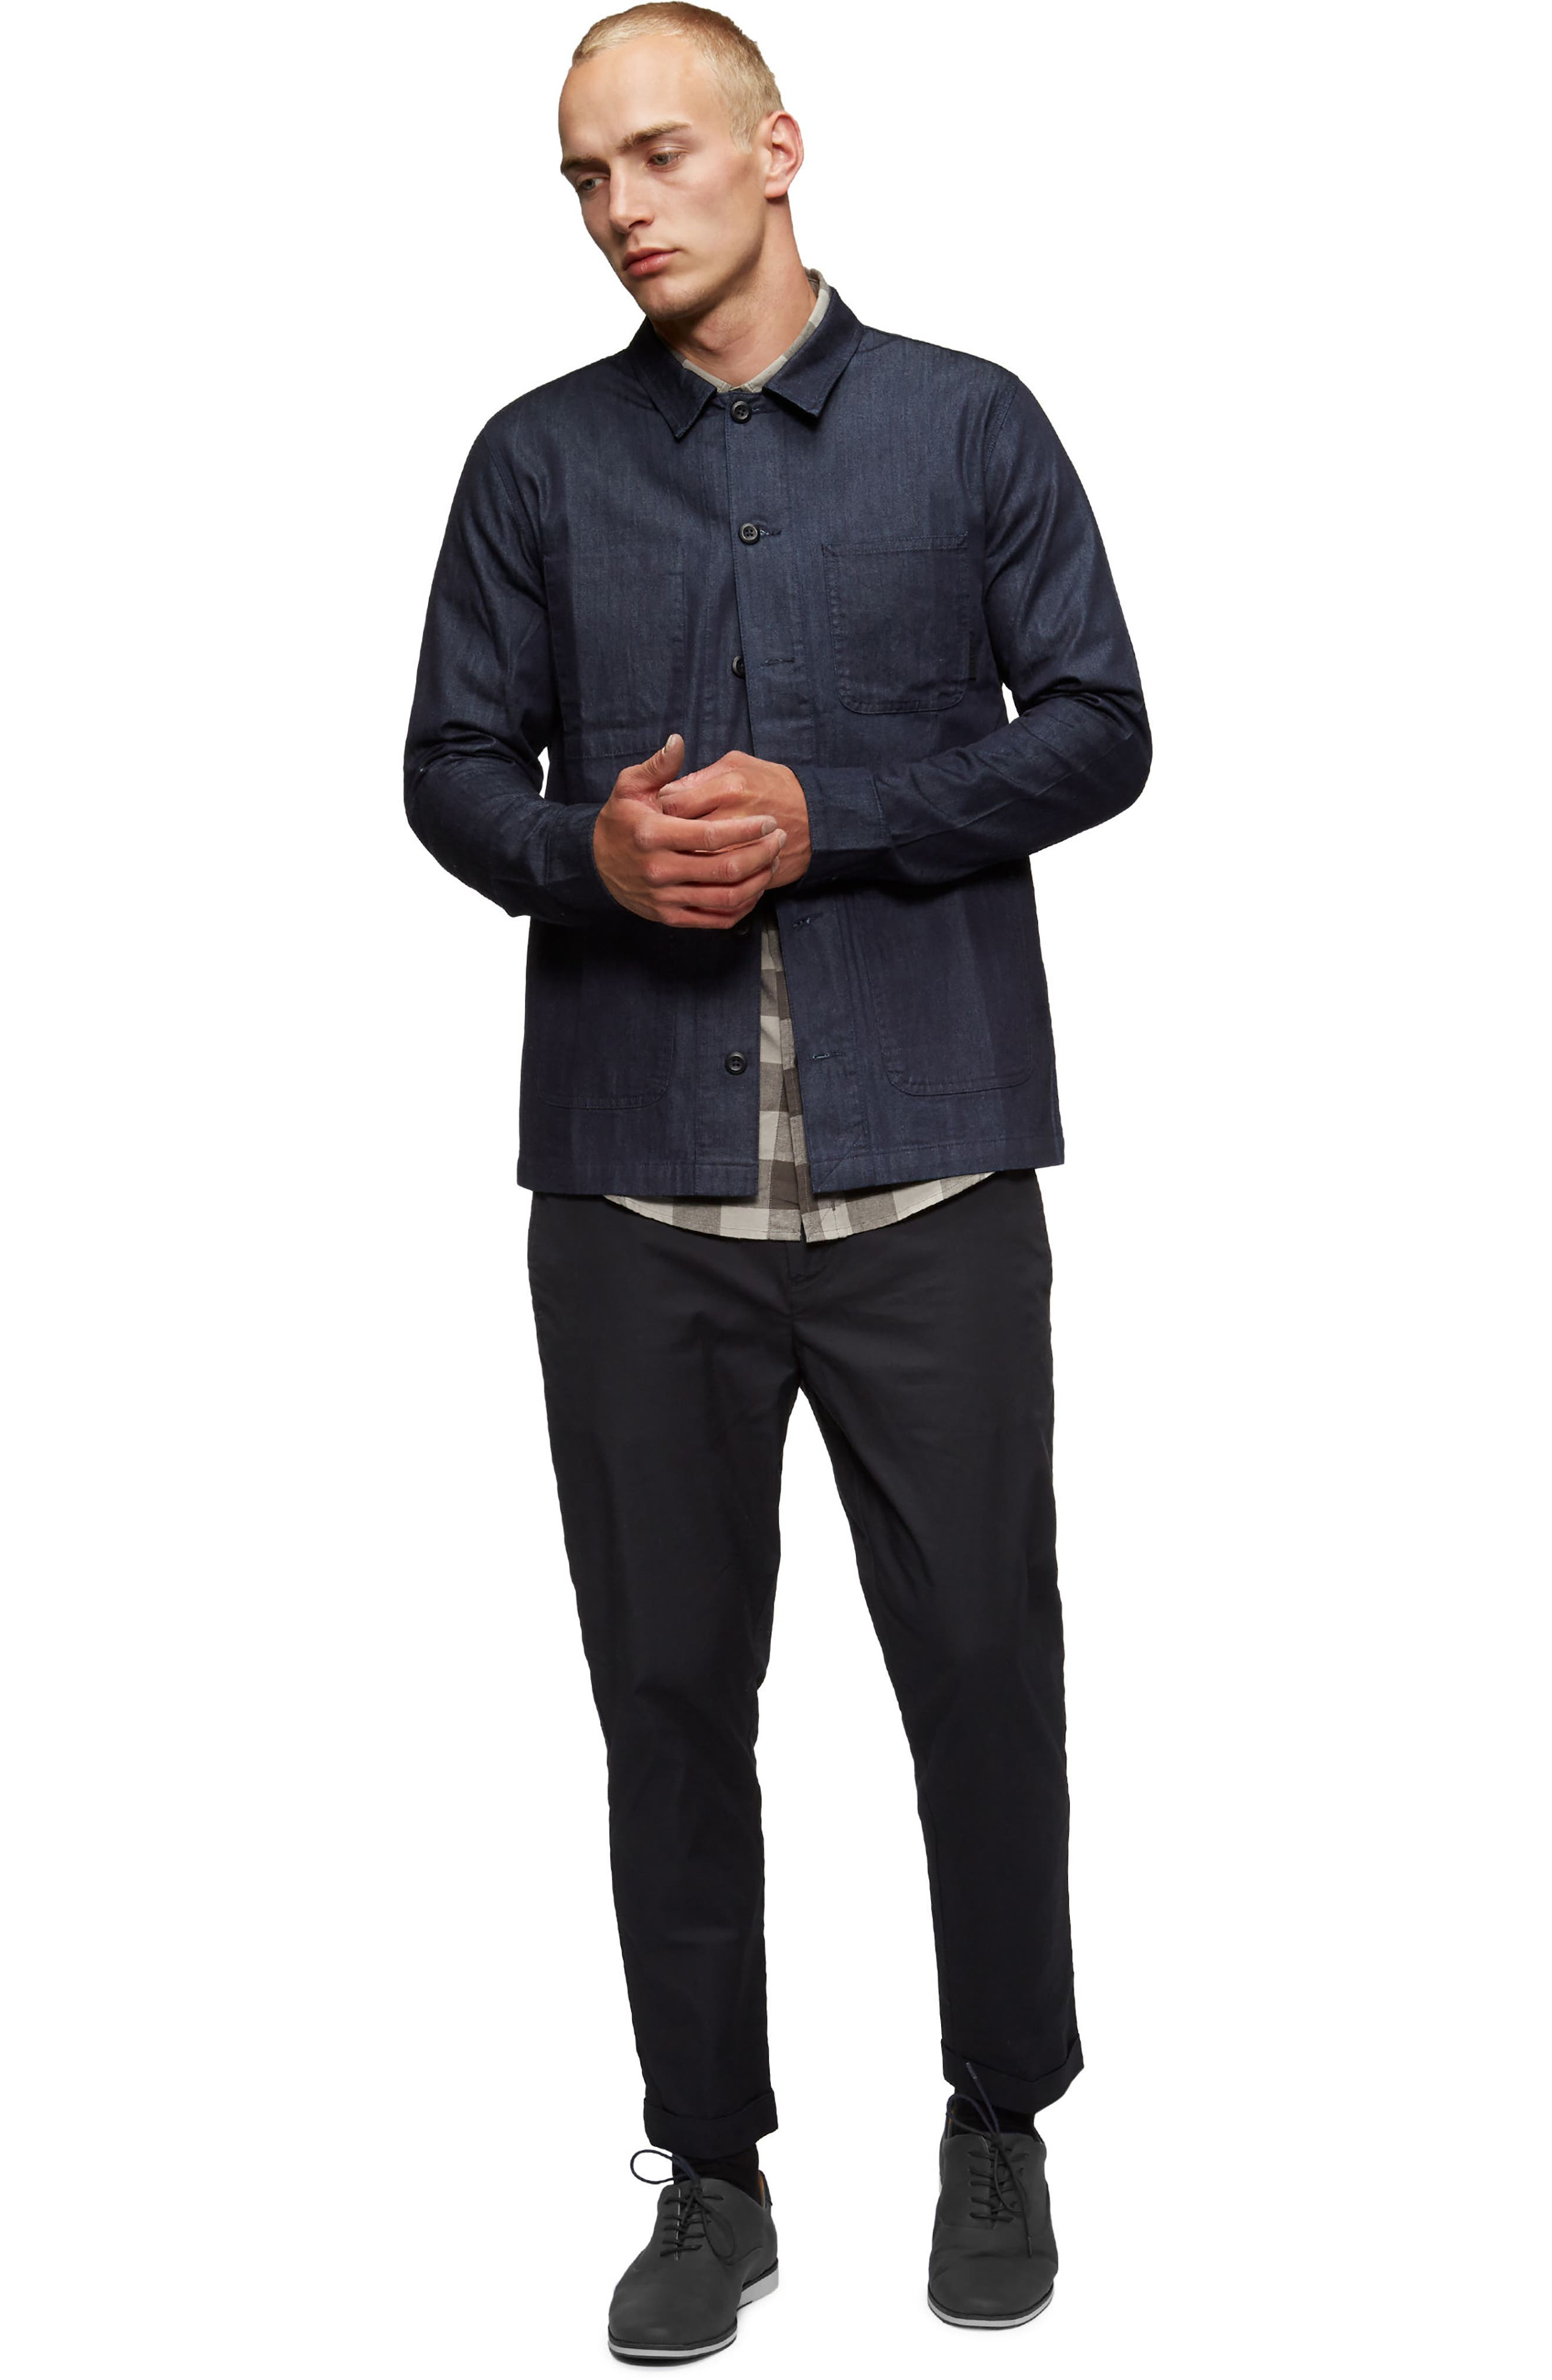 Cohen Long-Sleeve Shirt,                             Alternate thumbnail 4, color,                             Shadow Blue/ Olive